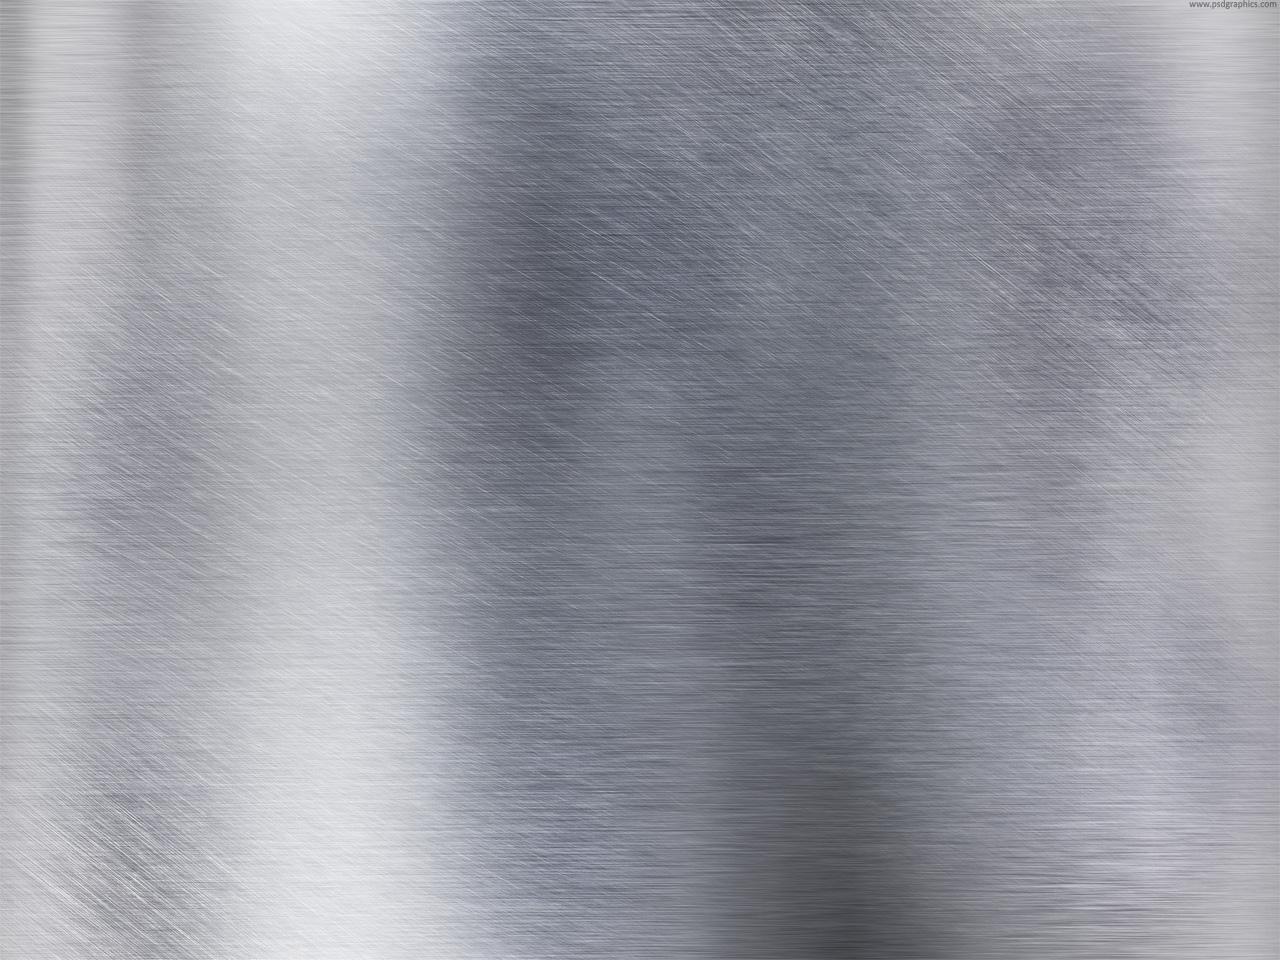 Scratched metal texture | PSDGraphics